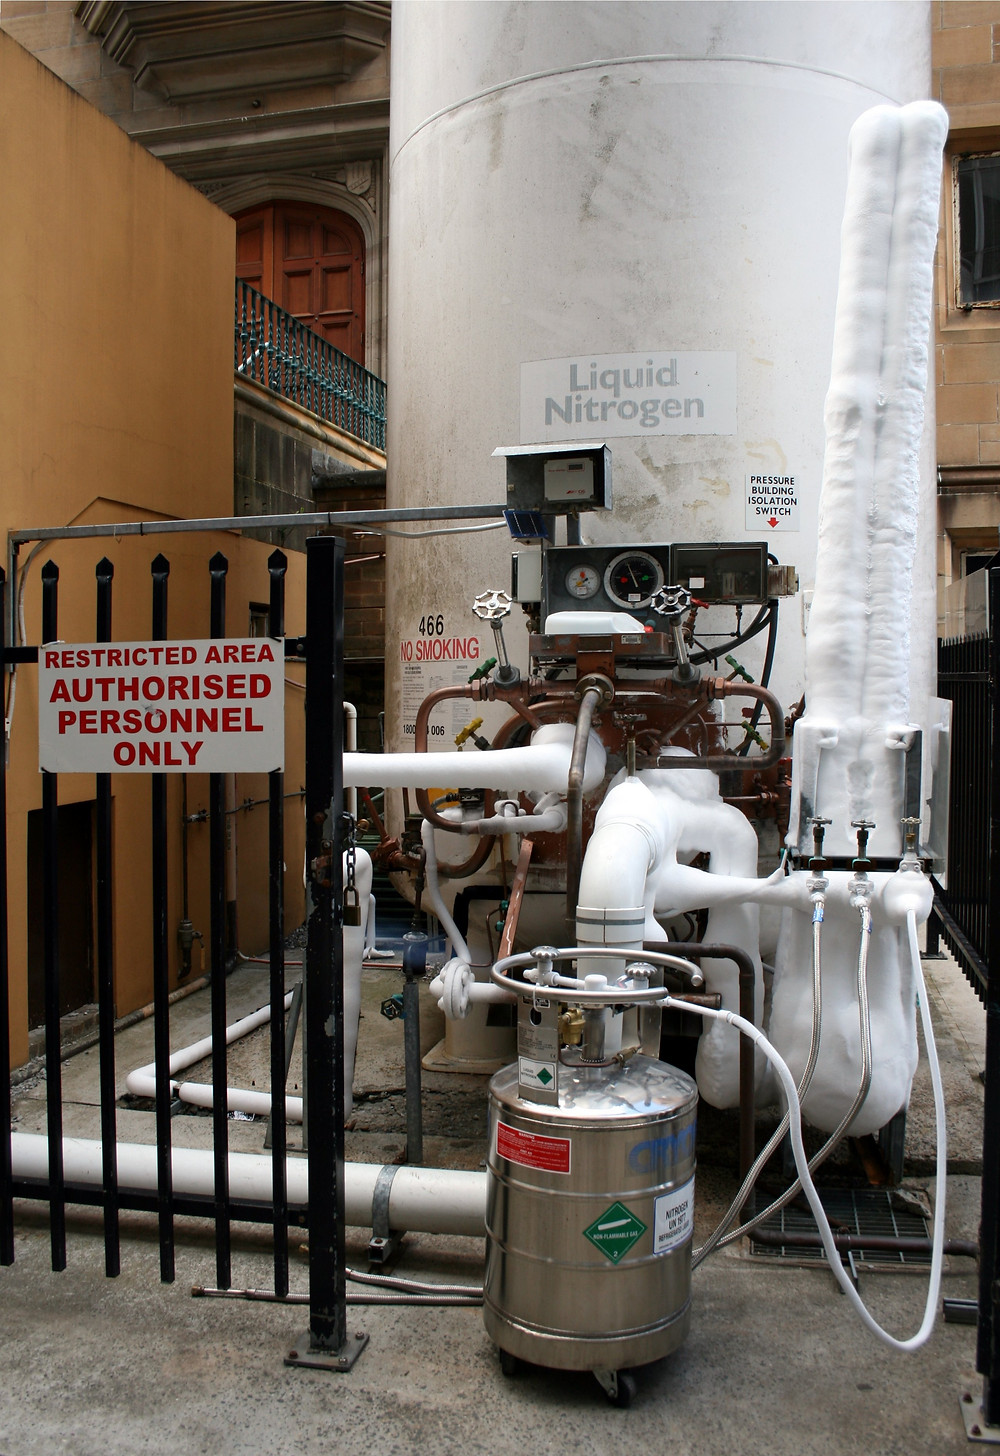 vacuum sensor, gauge, thermocouple, dv series, 열전대, 내구성, 경제성, nitrogen, helium, cryogenic, 질소, 헬륨, 초저온, 미국 군사규격, u.s military standard, 온도, temperature, warning, 주의사항